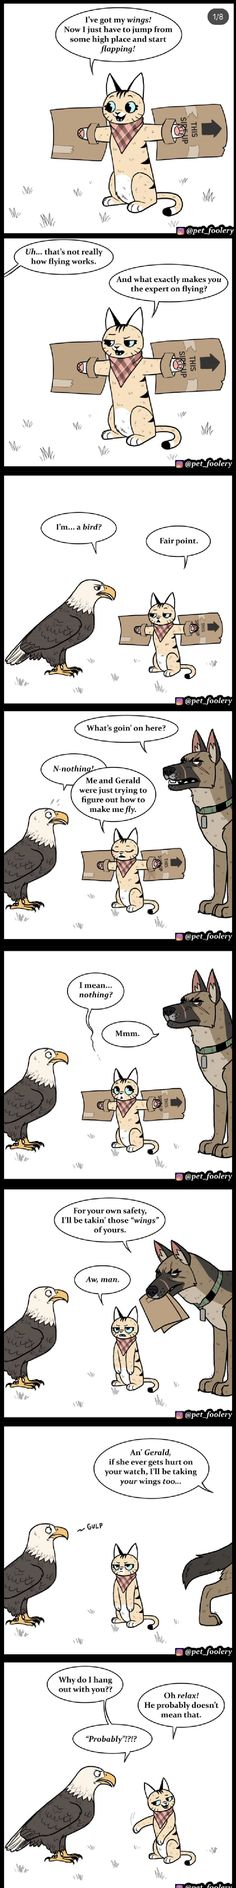 Funny Animal Comics, Dog Comics, Funny Animal Jokes, Cute Funny Animals, Stupid Funny Memes, Funny Comics, Really Funny Memes, Animal Memes, Cute Funny Cartoons